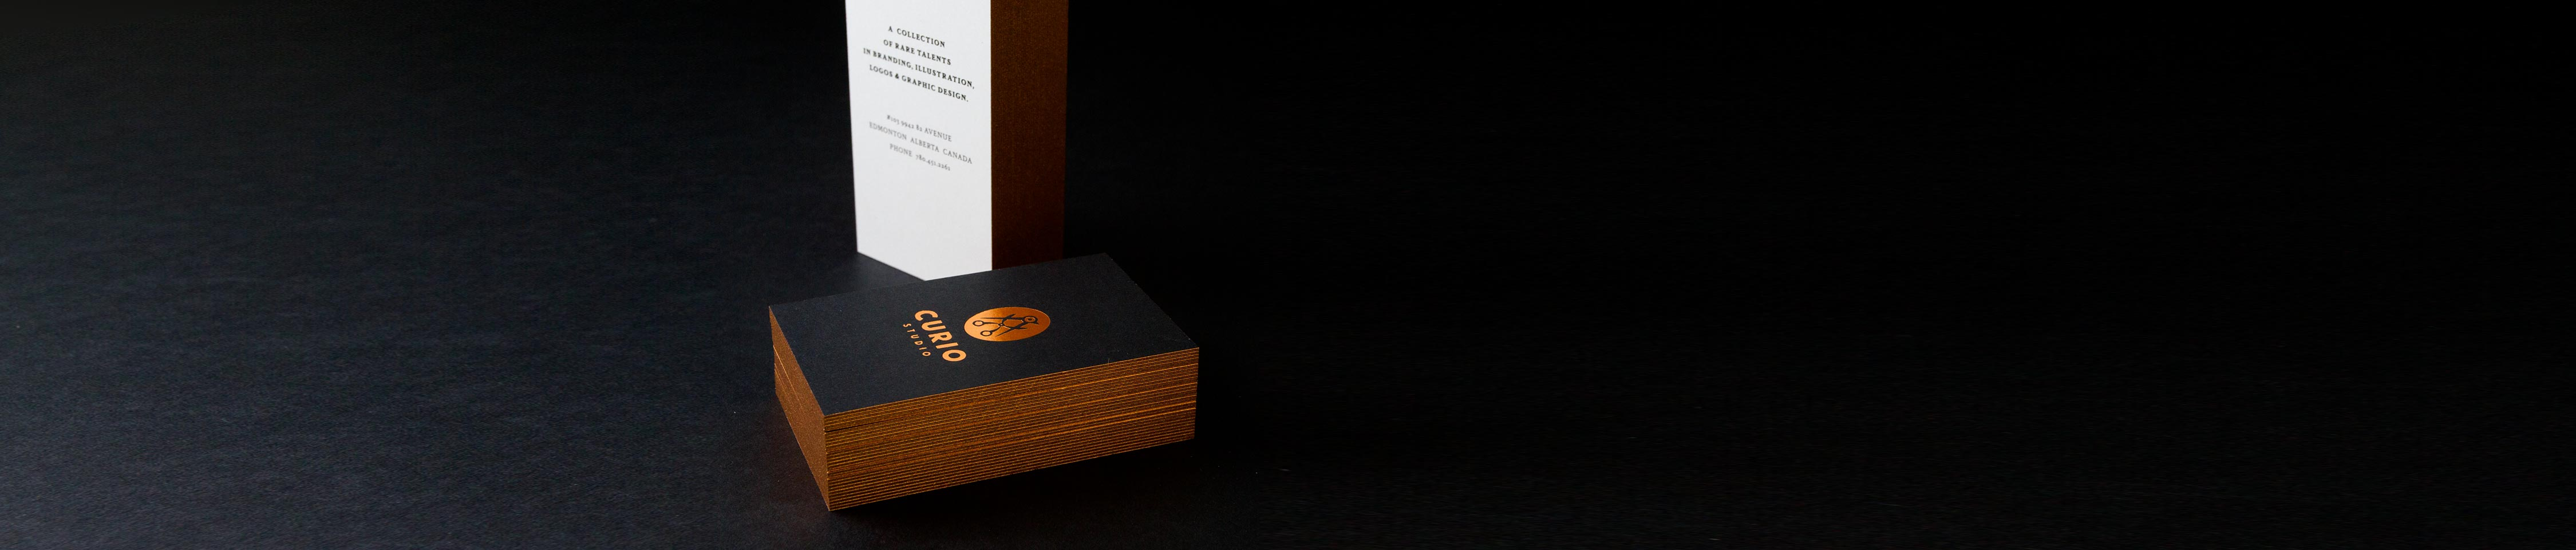 Black Business Cards | Black Suede Cards